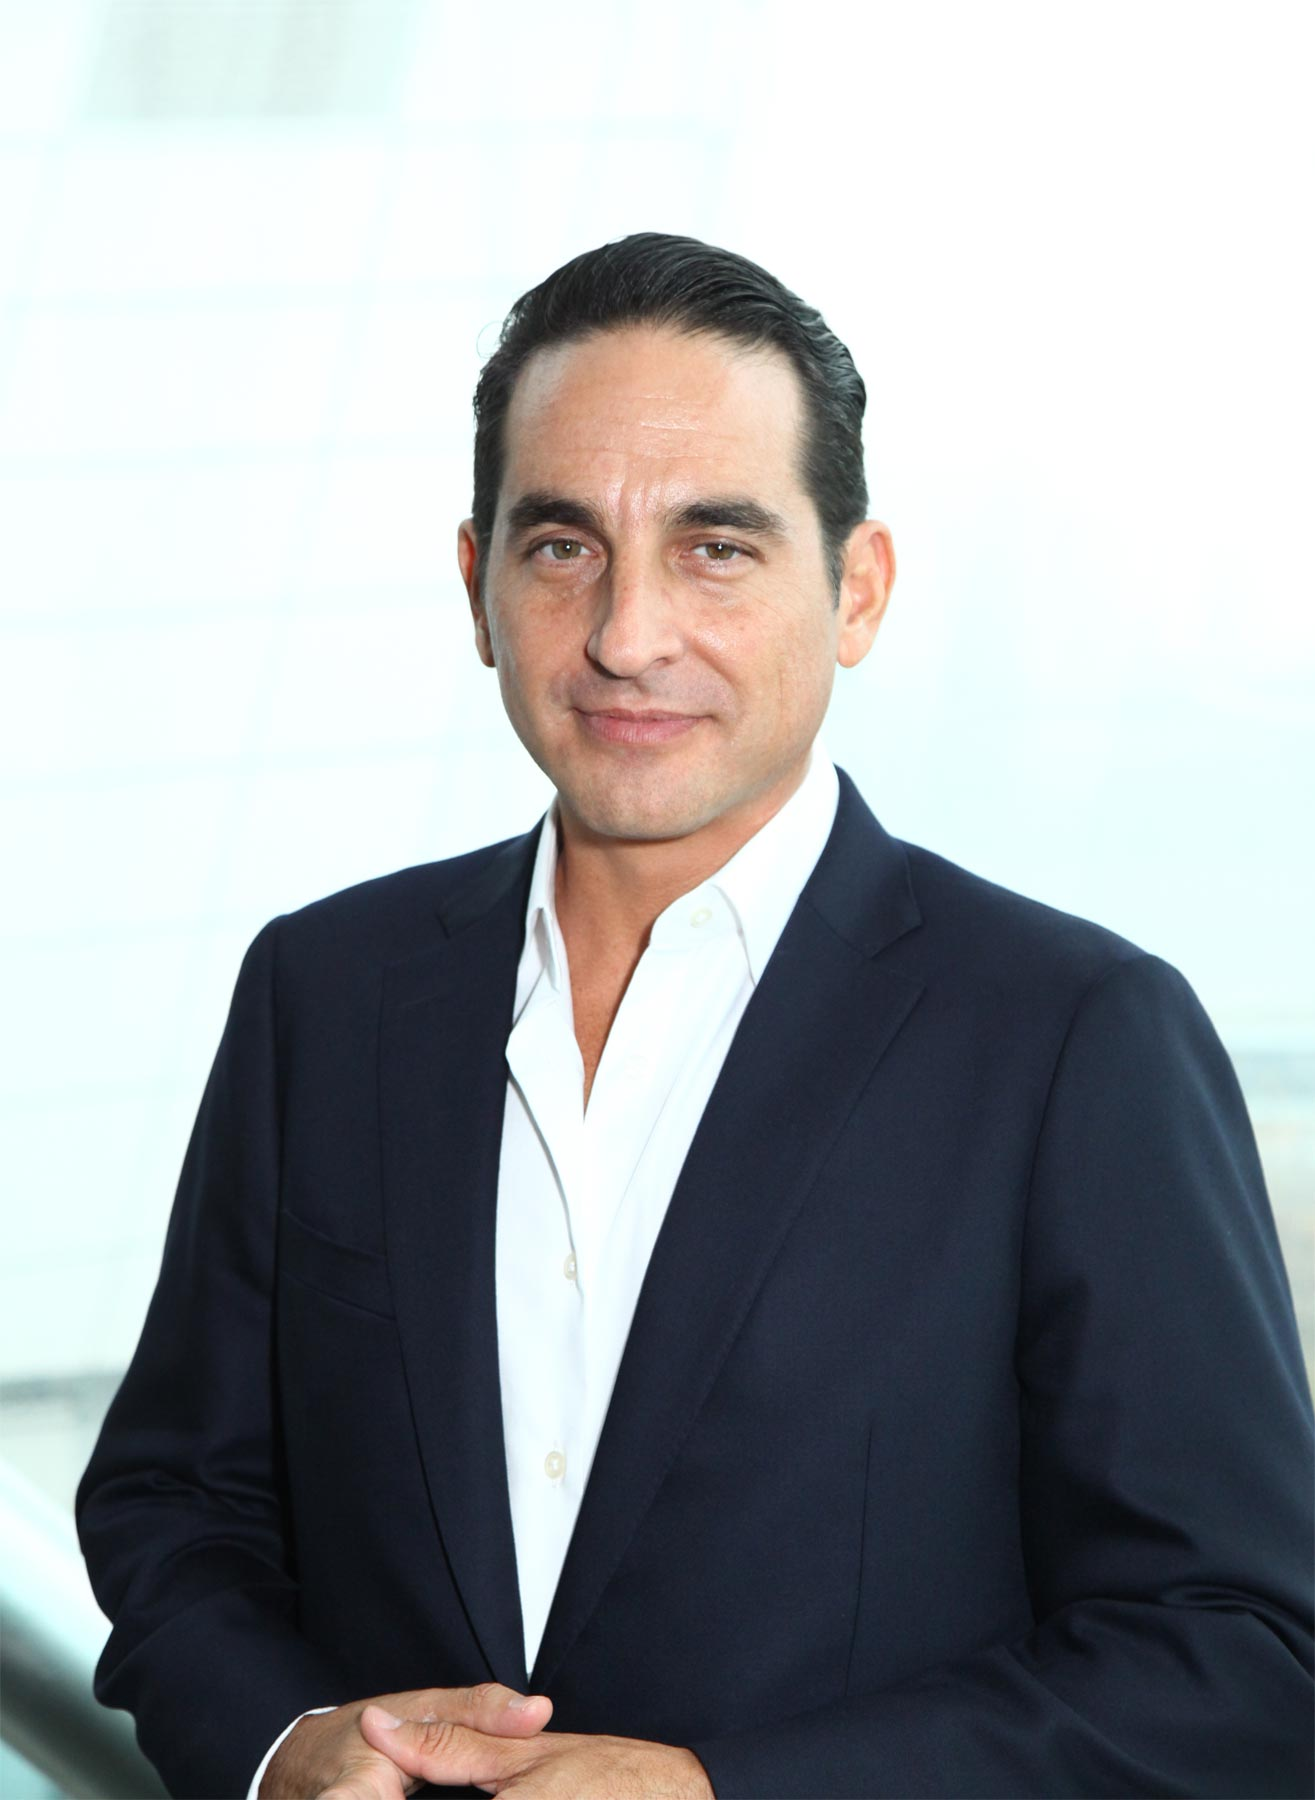 John Blanco, CEO of Afini